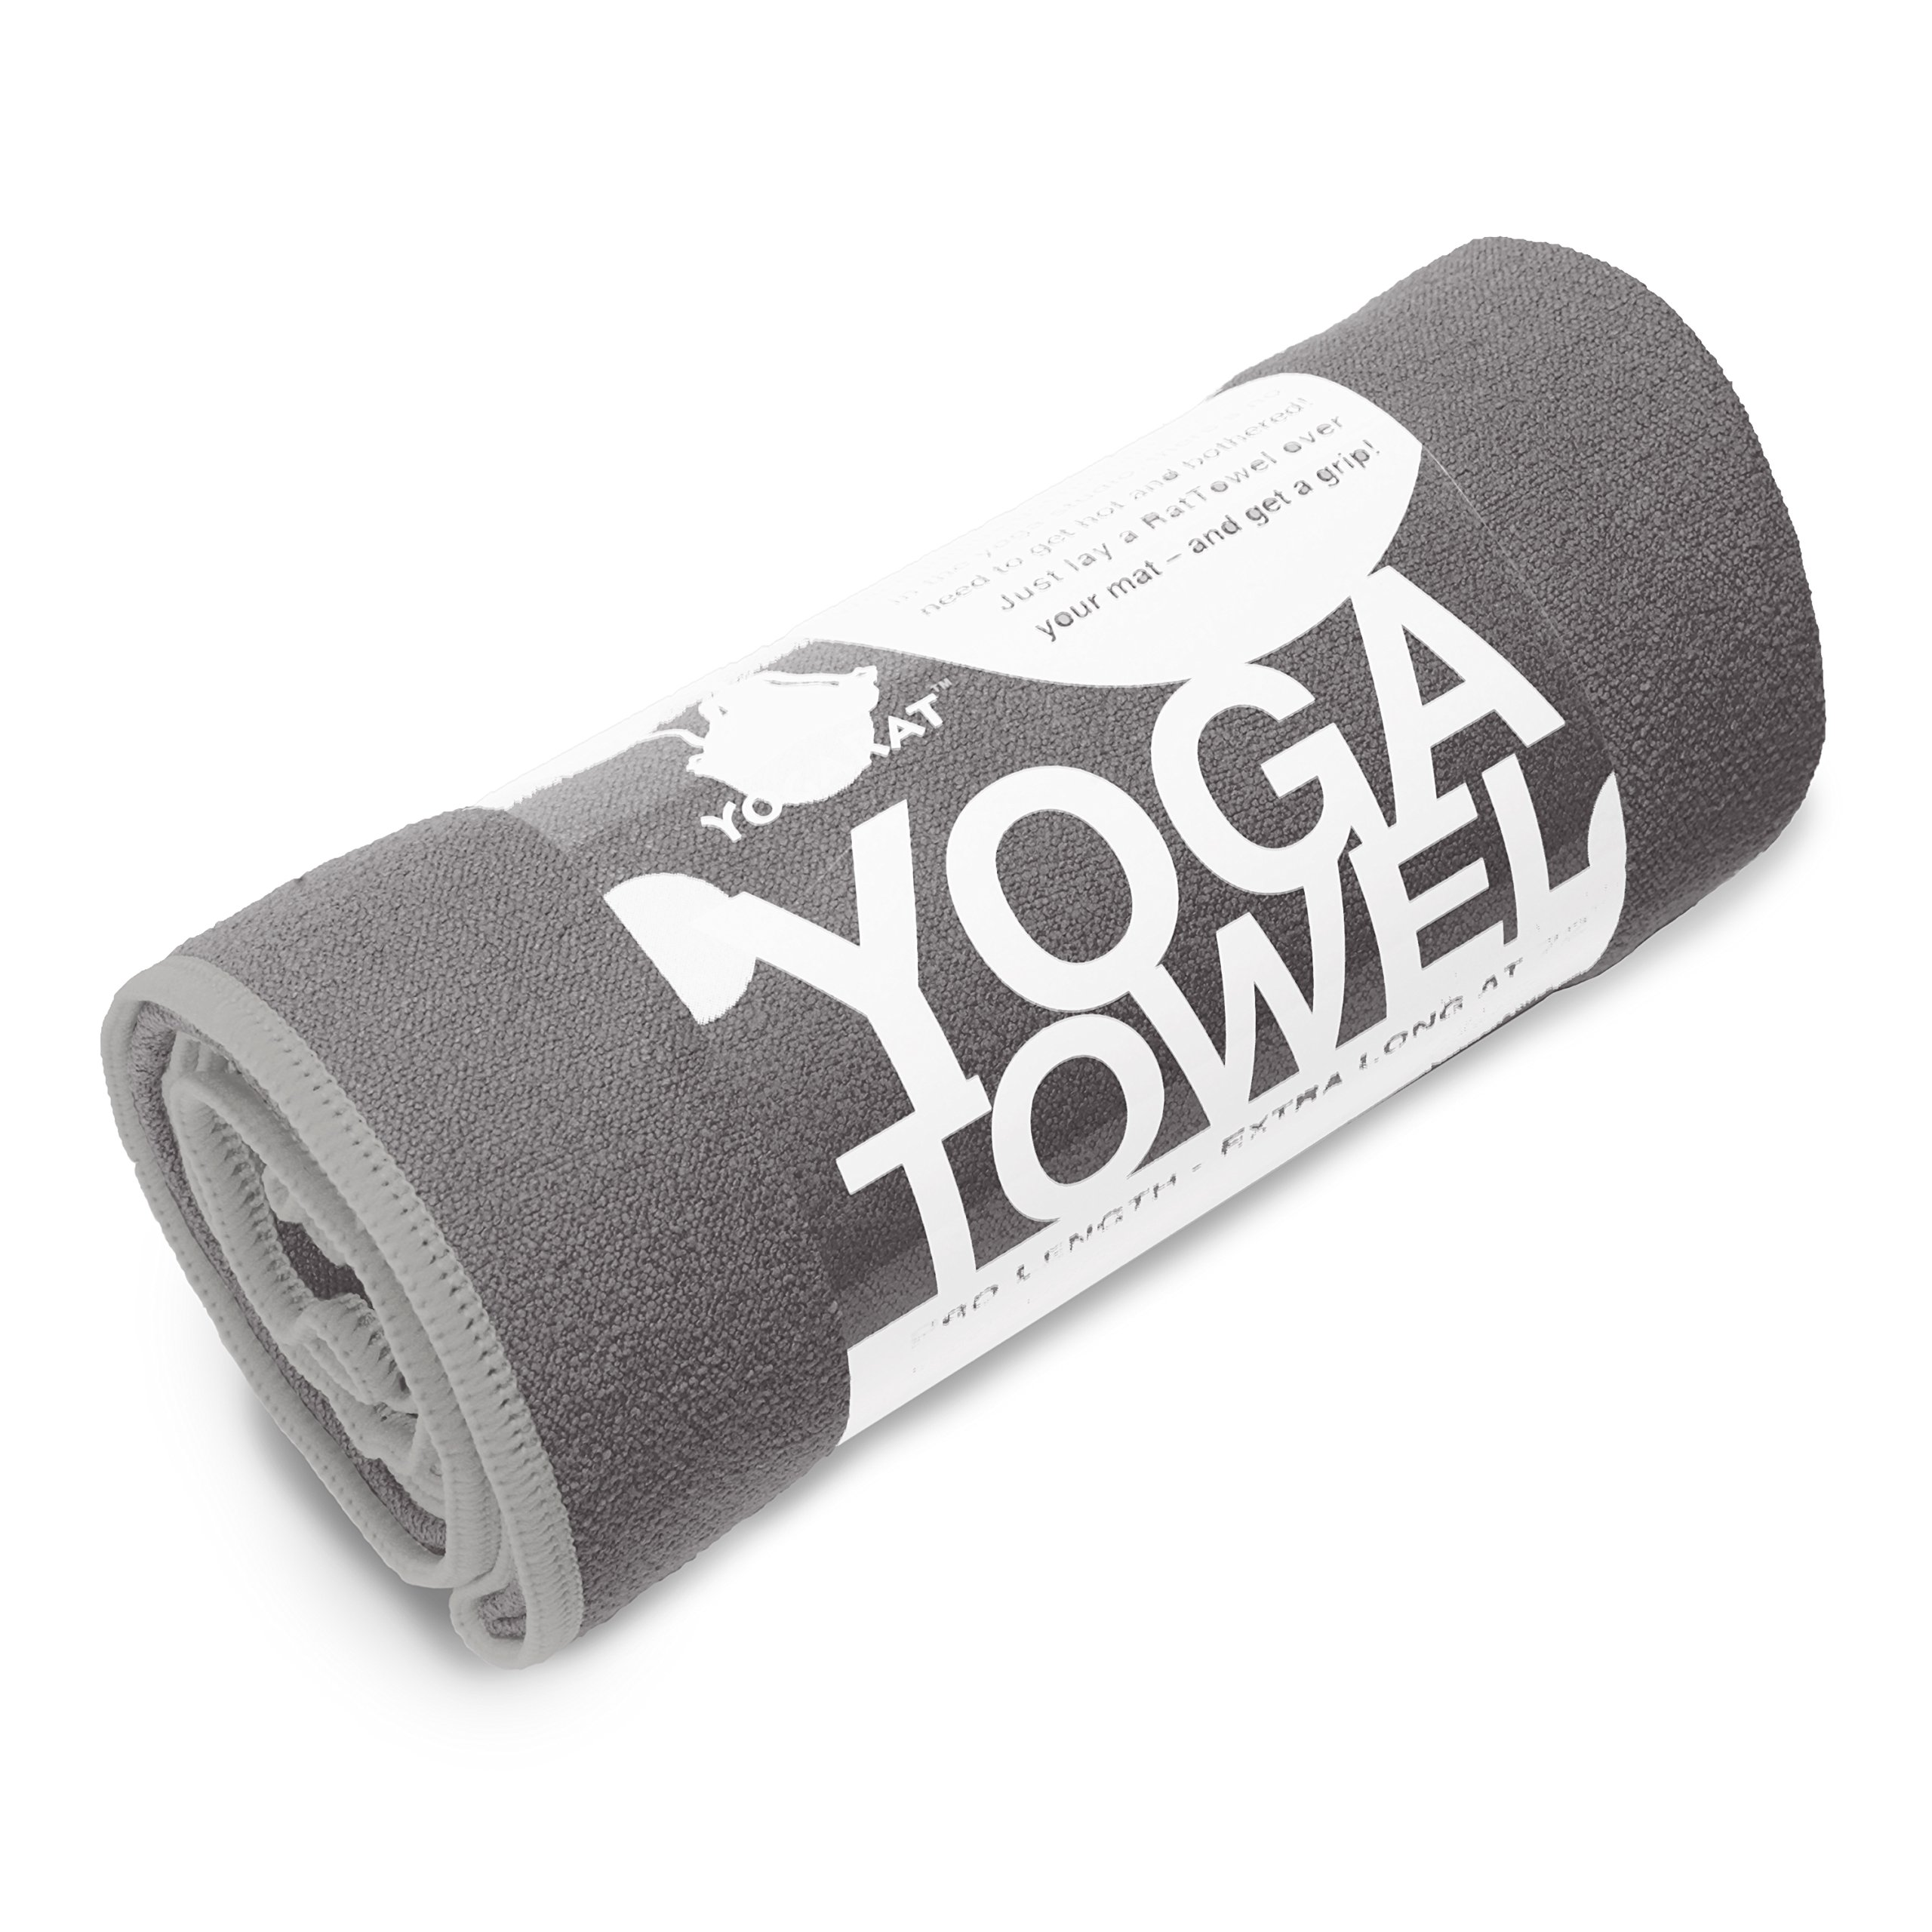 props journal meditation women photo c athletica towels mats yoga lululemon mat n of